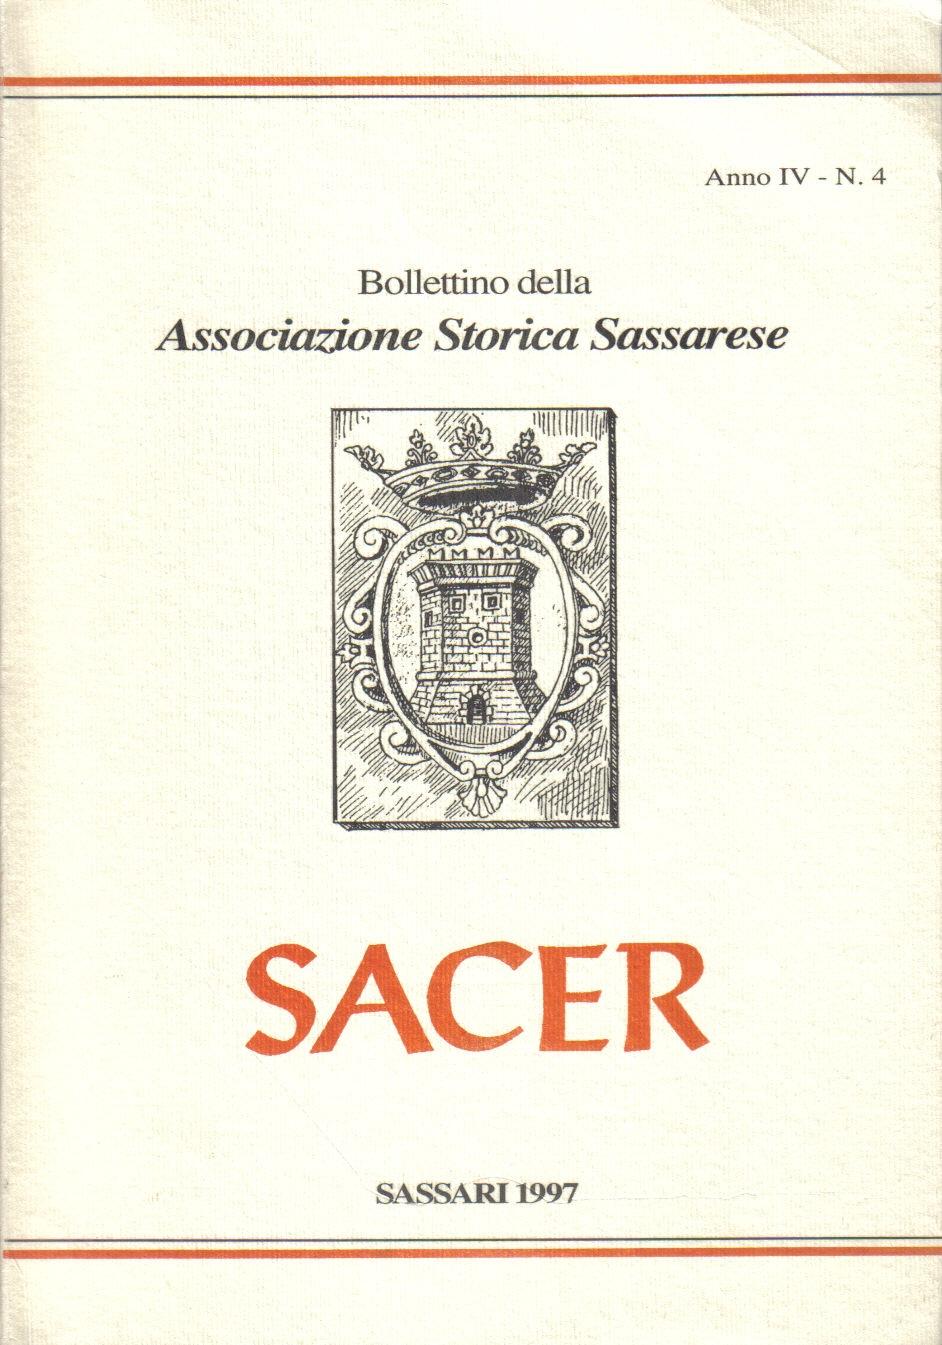 Sacer